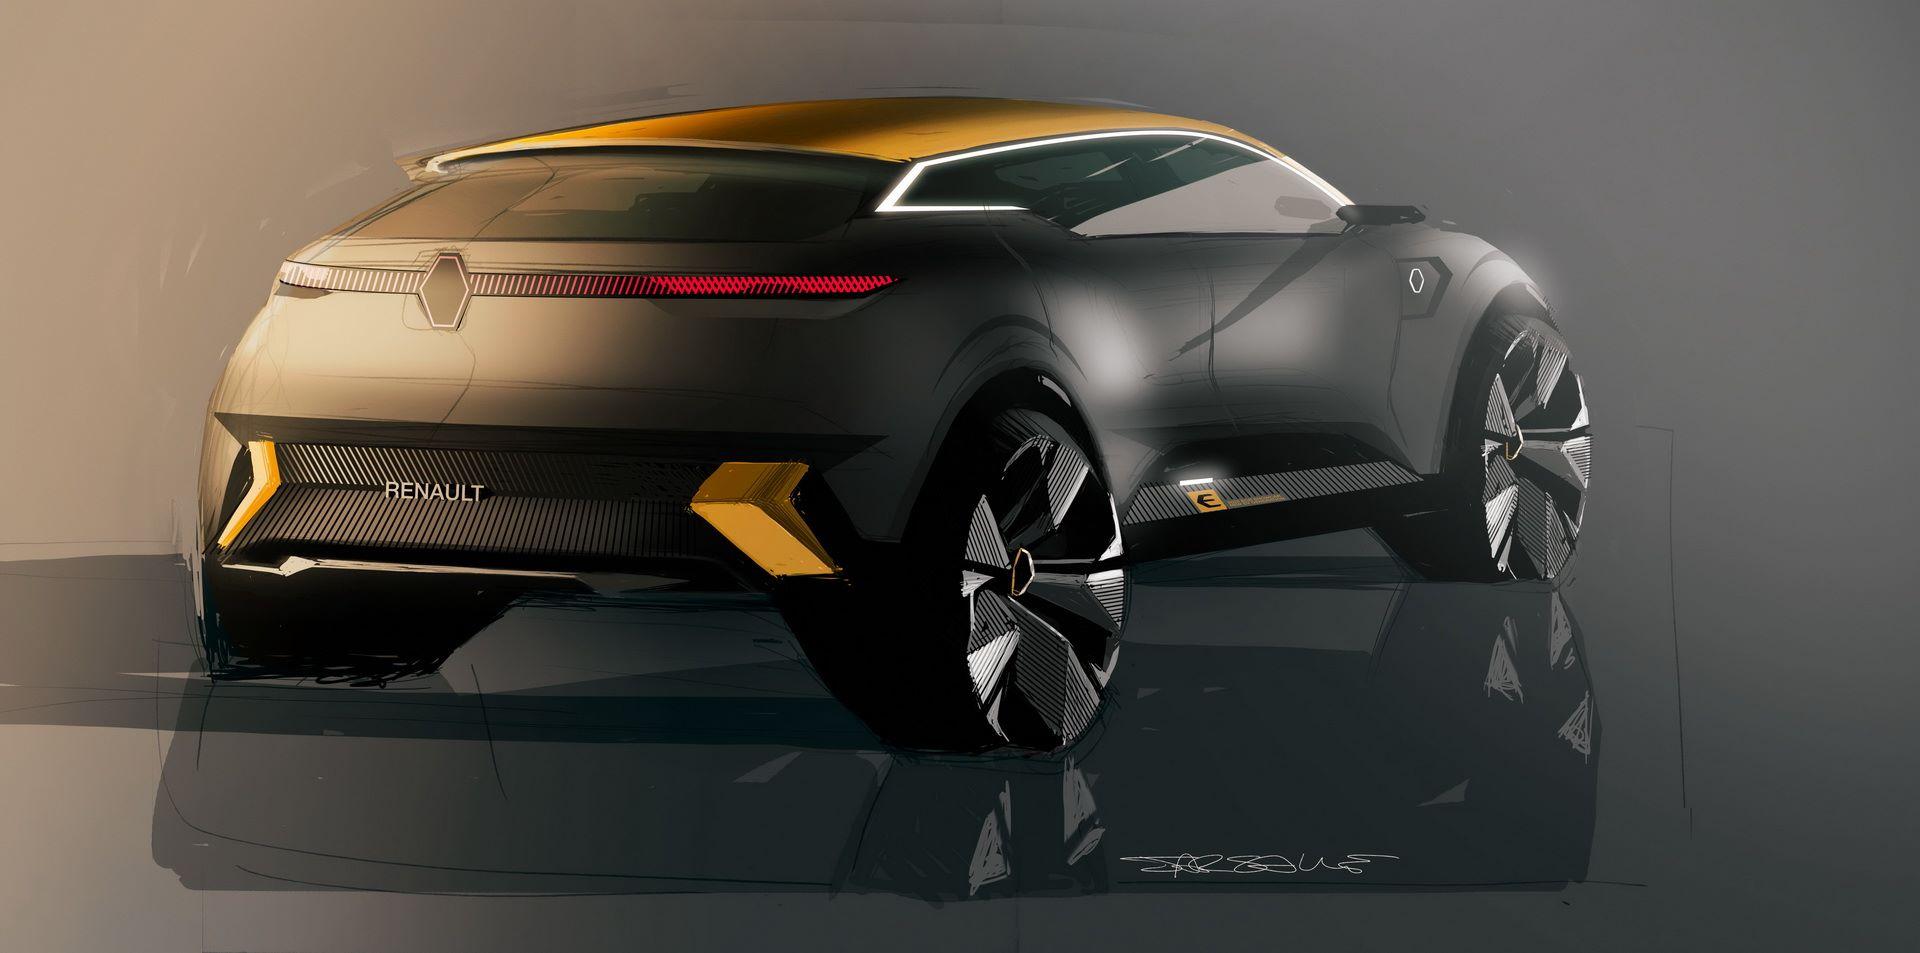 Renault-Megane-eVision-Concept-7